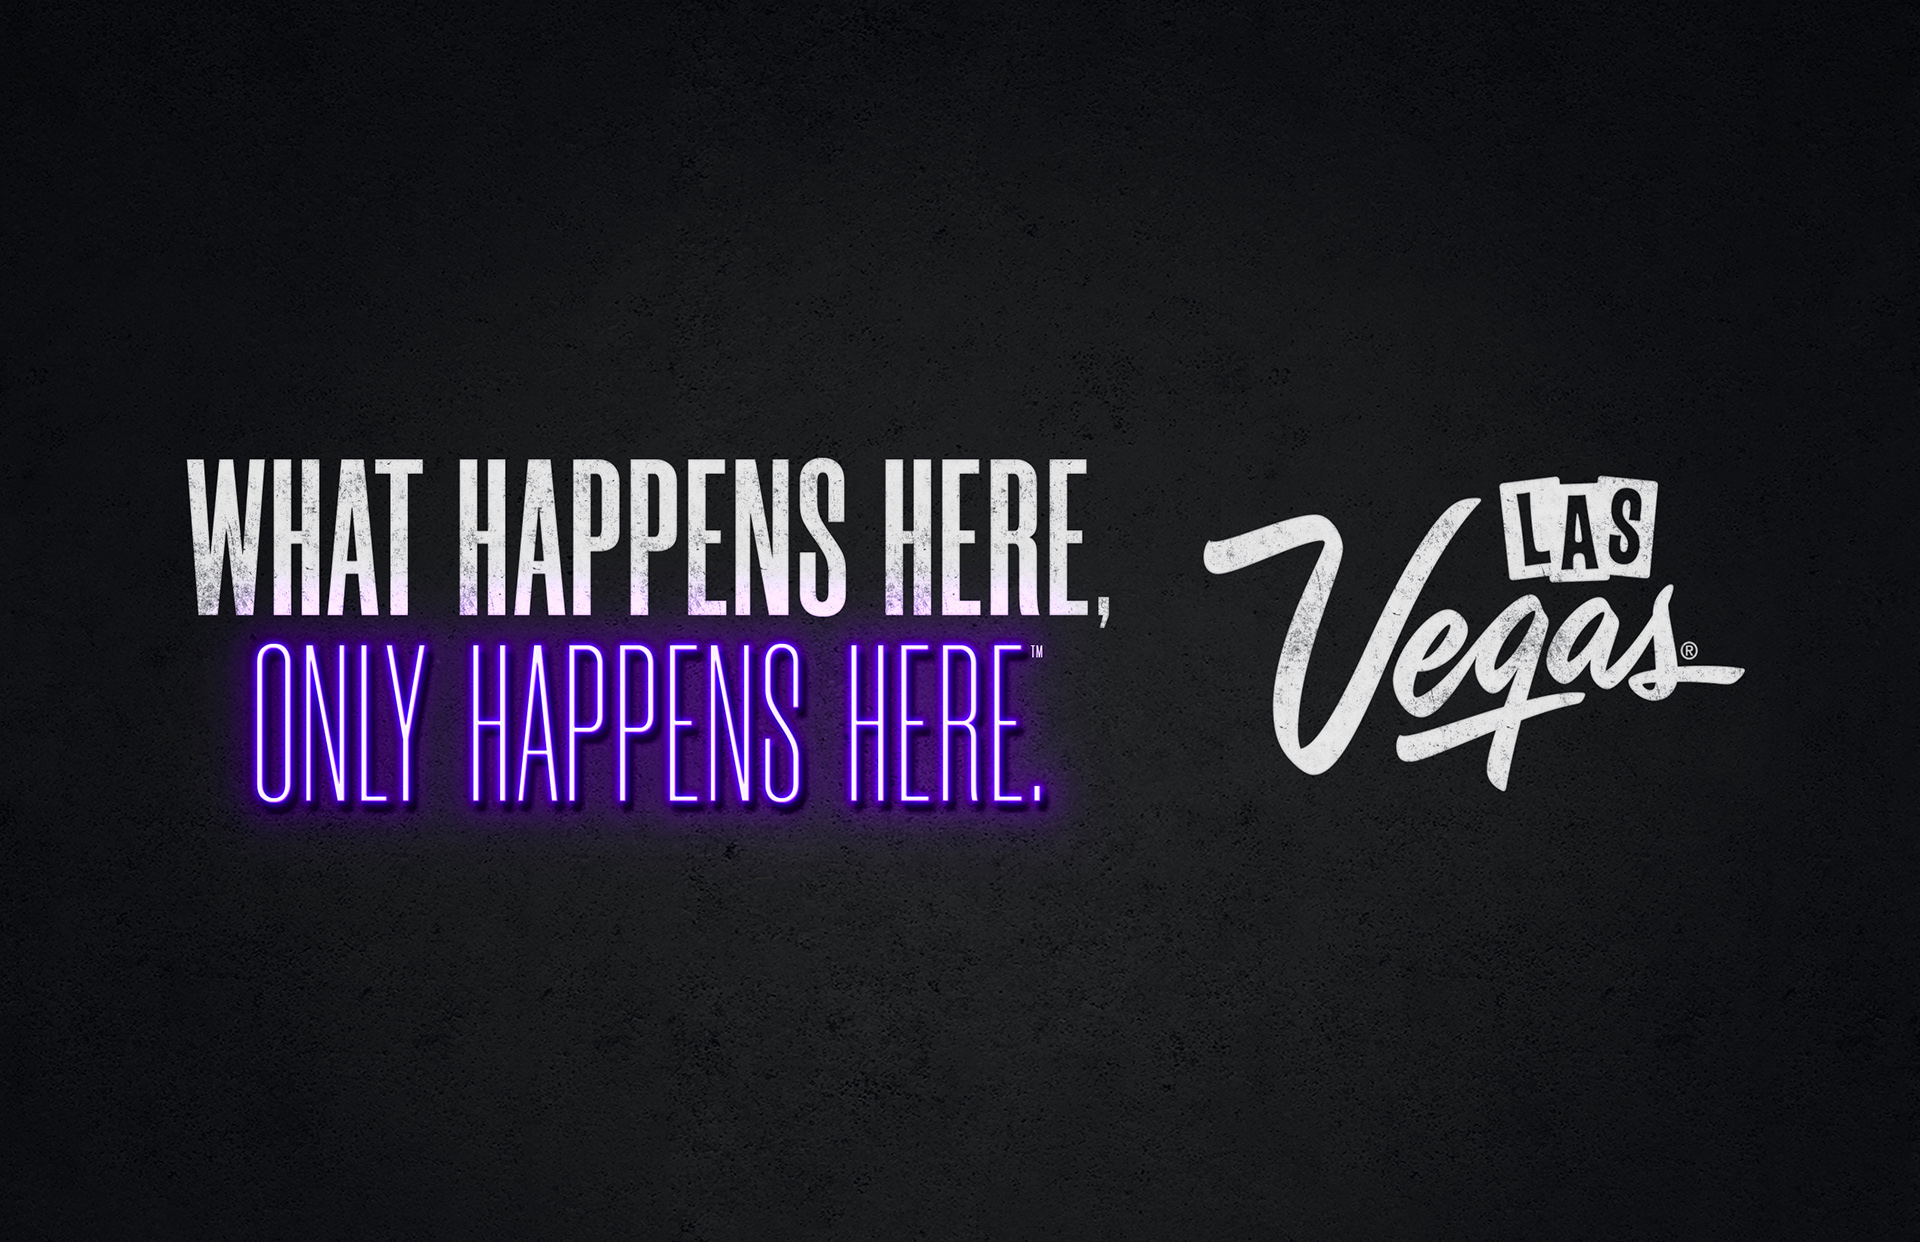 Ryan_Bubion_Las_Vegas_Gallery_02